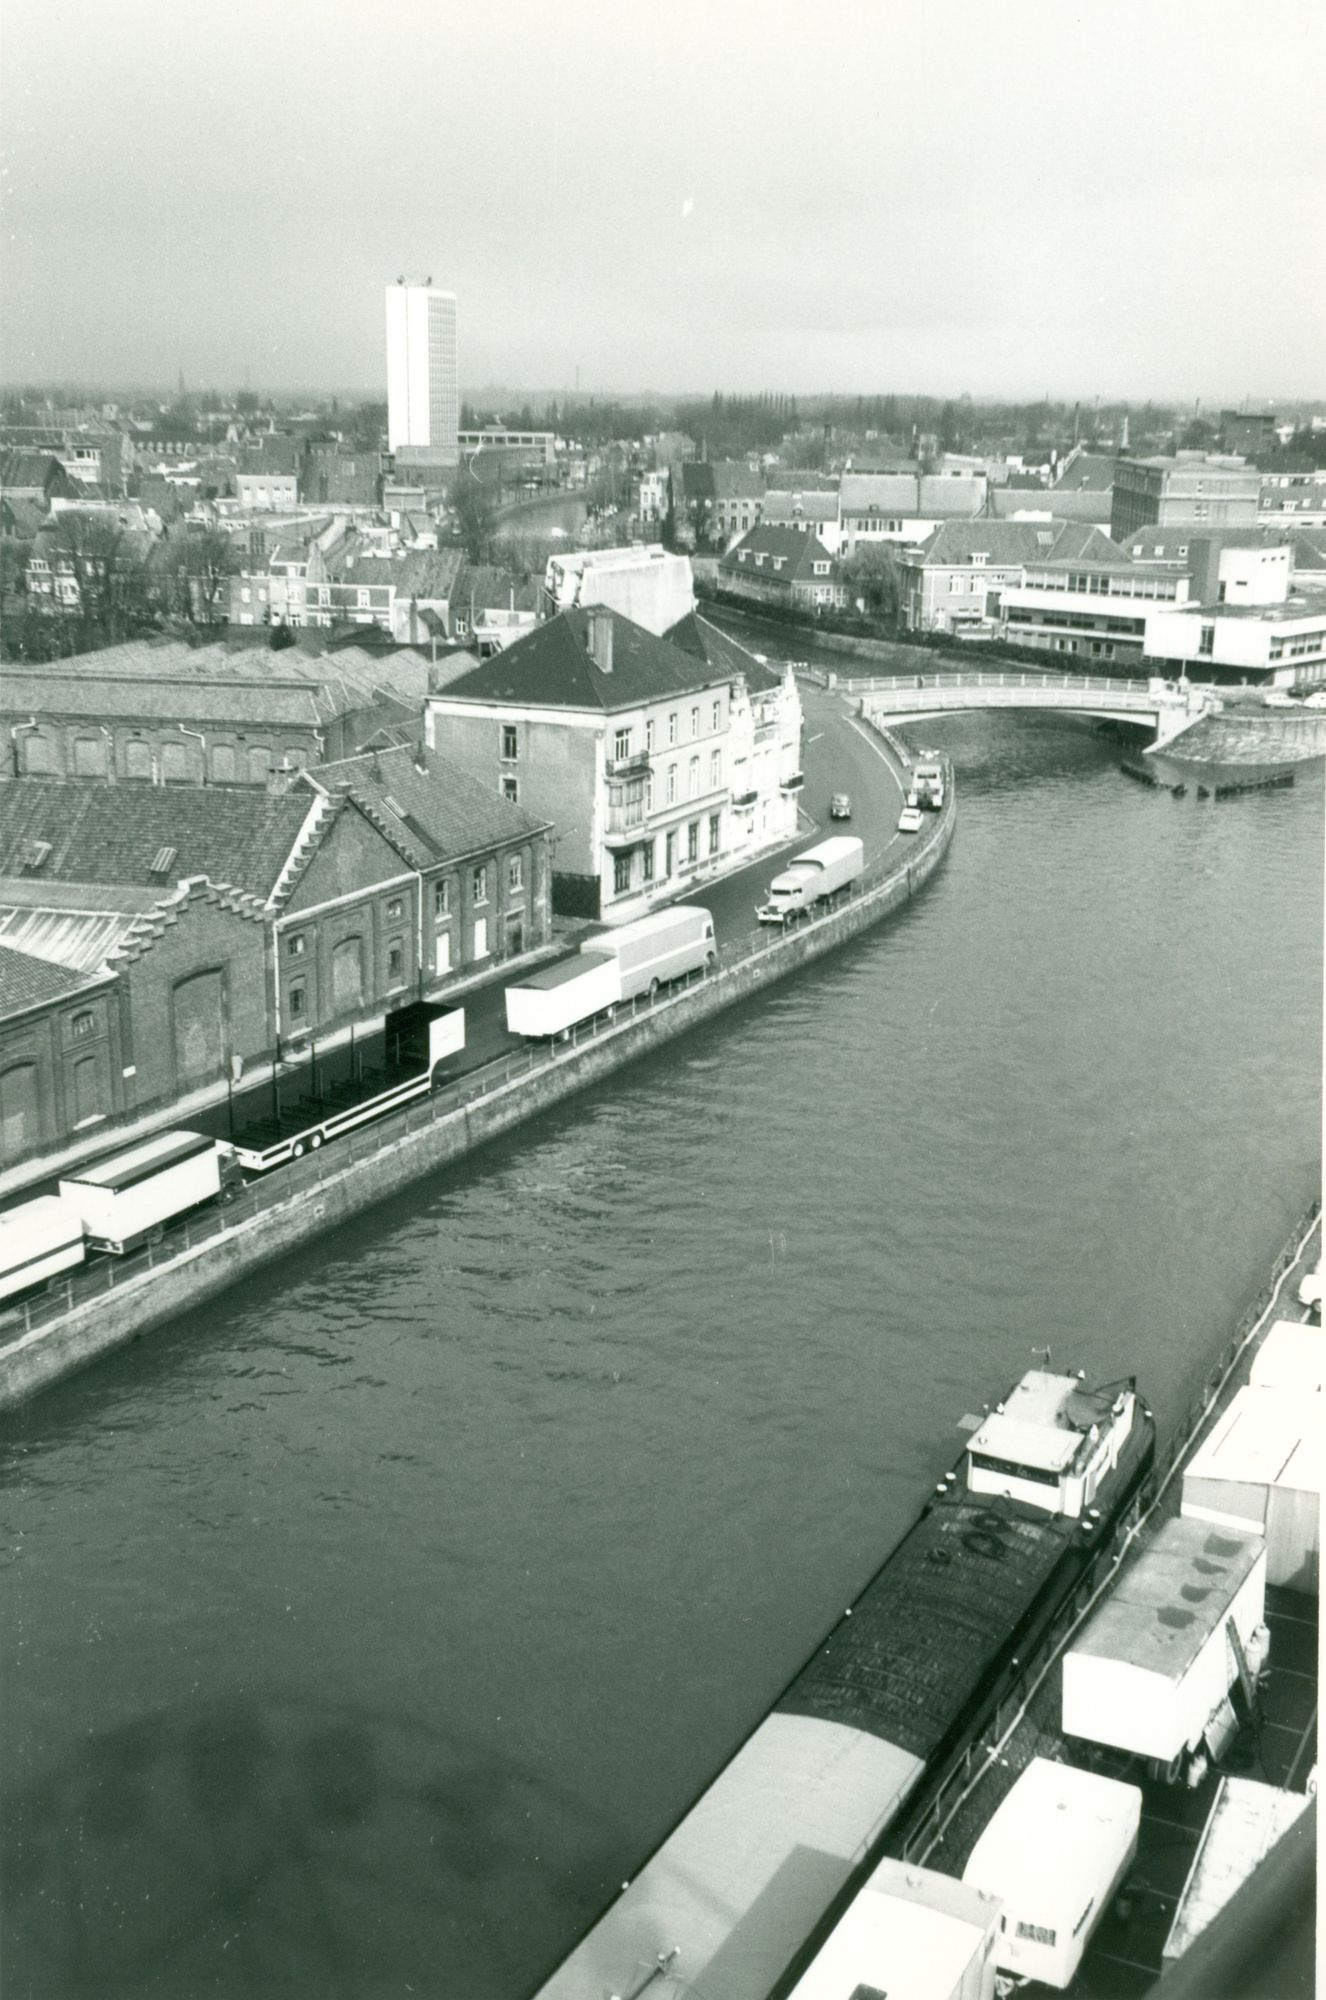 Nijverheidskaai 1975